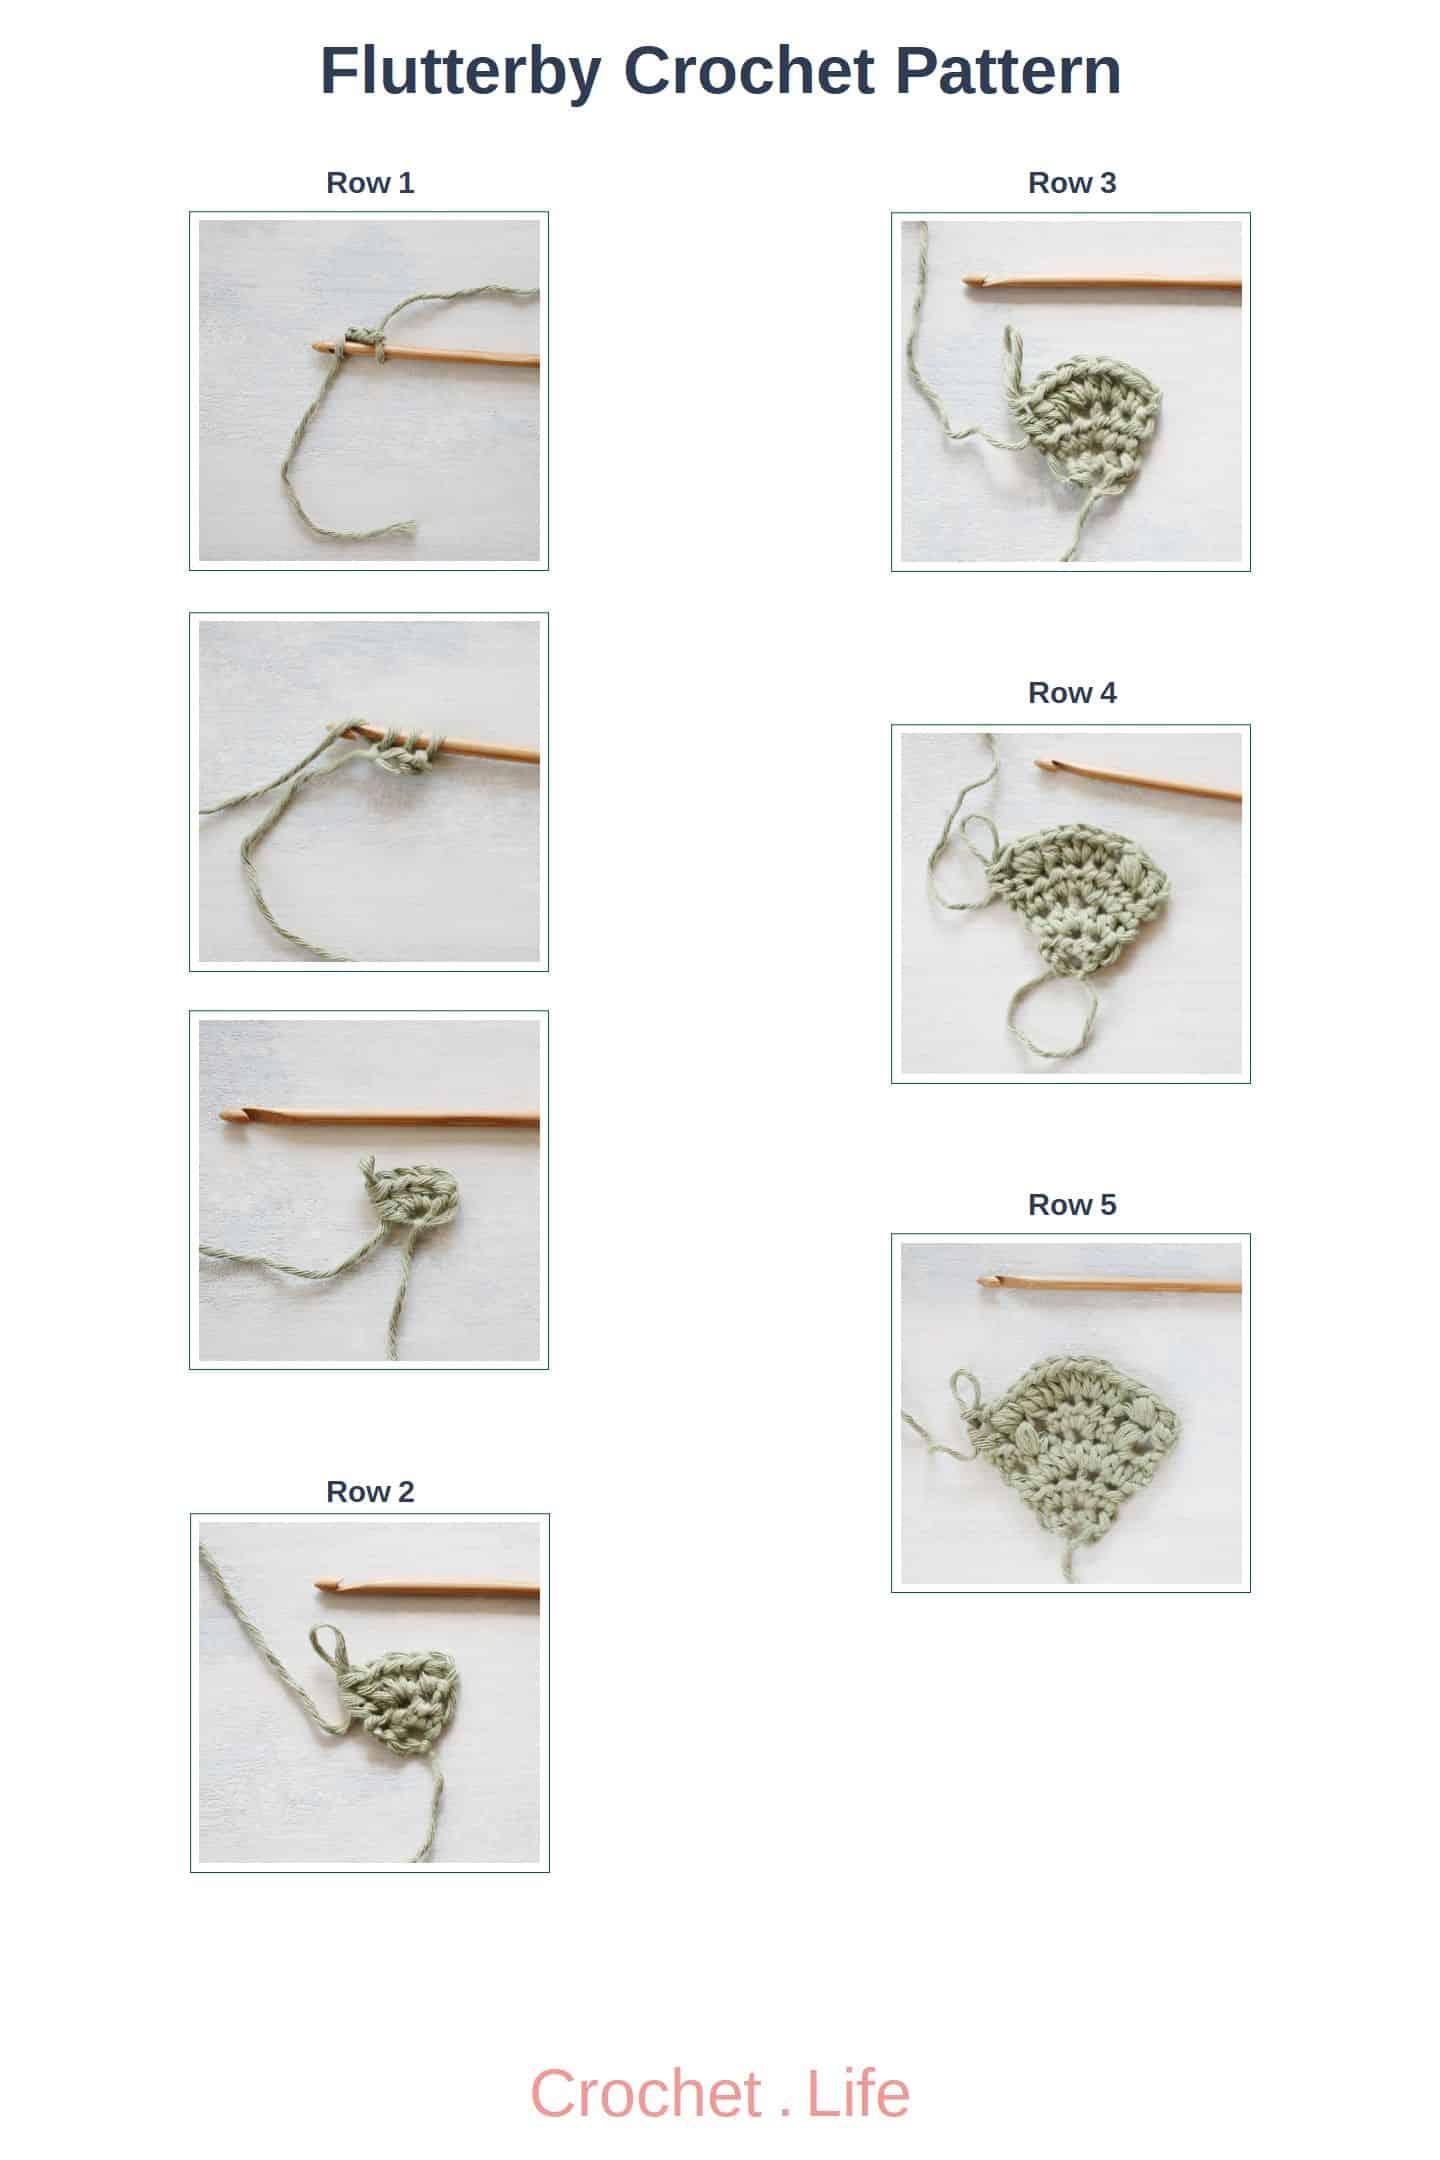 Flutterby Crochet Pattern Rows 1 through 5